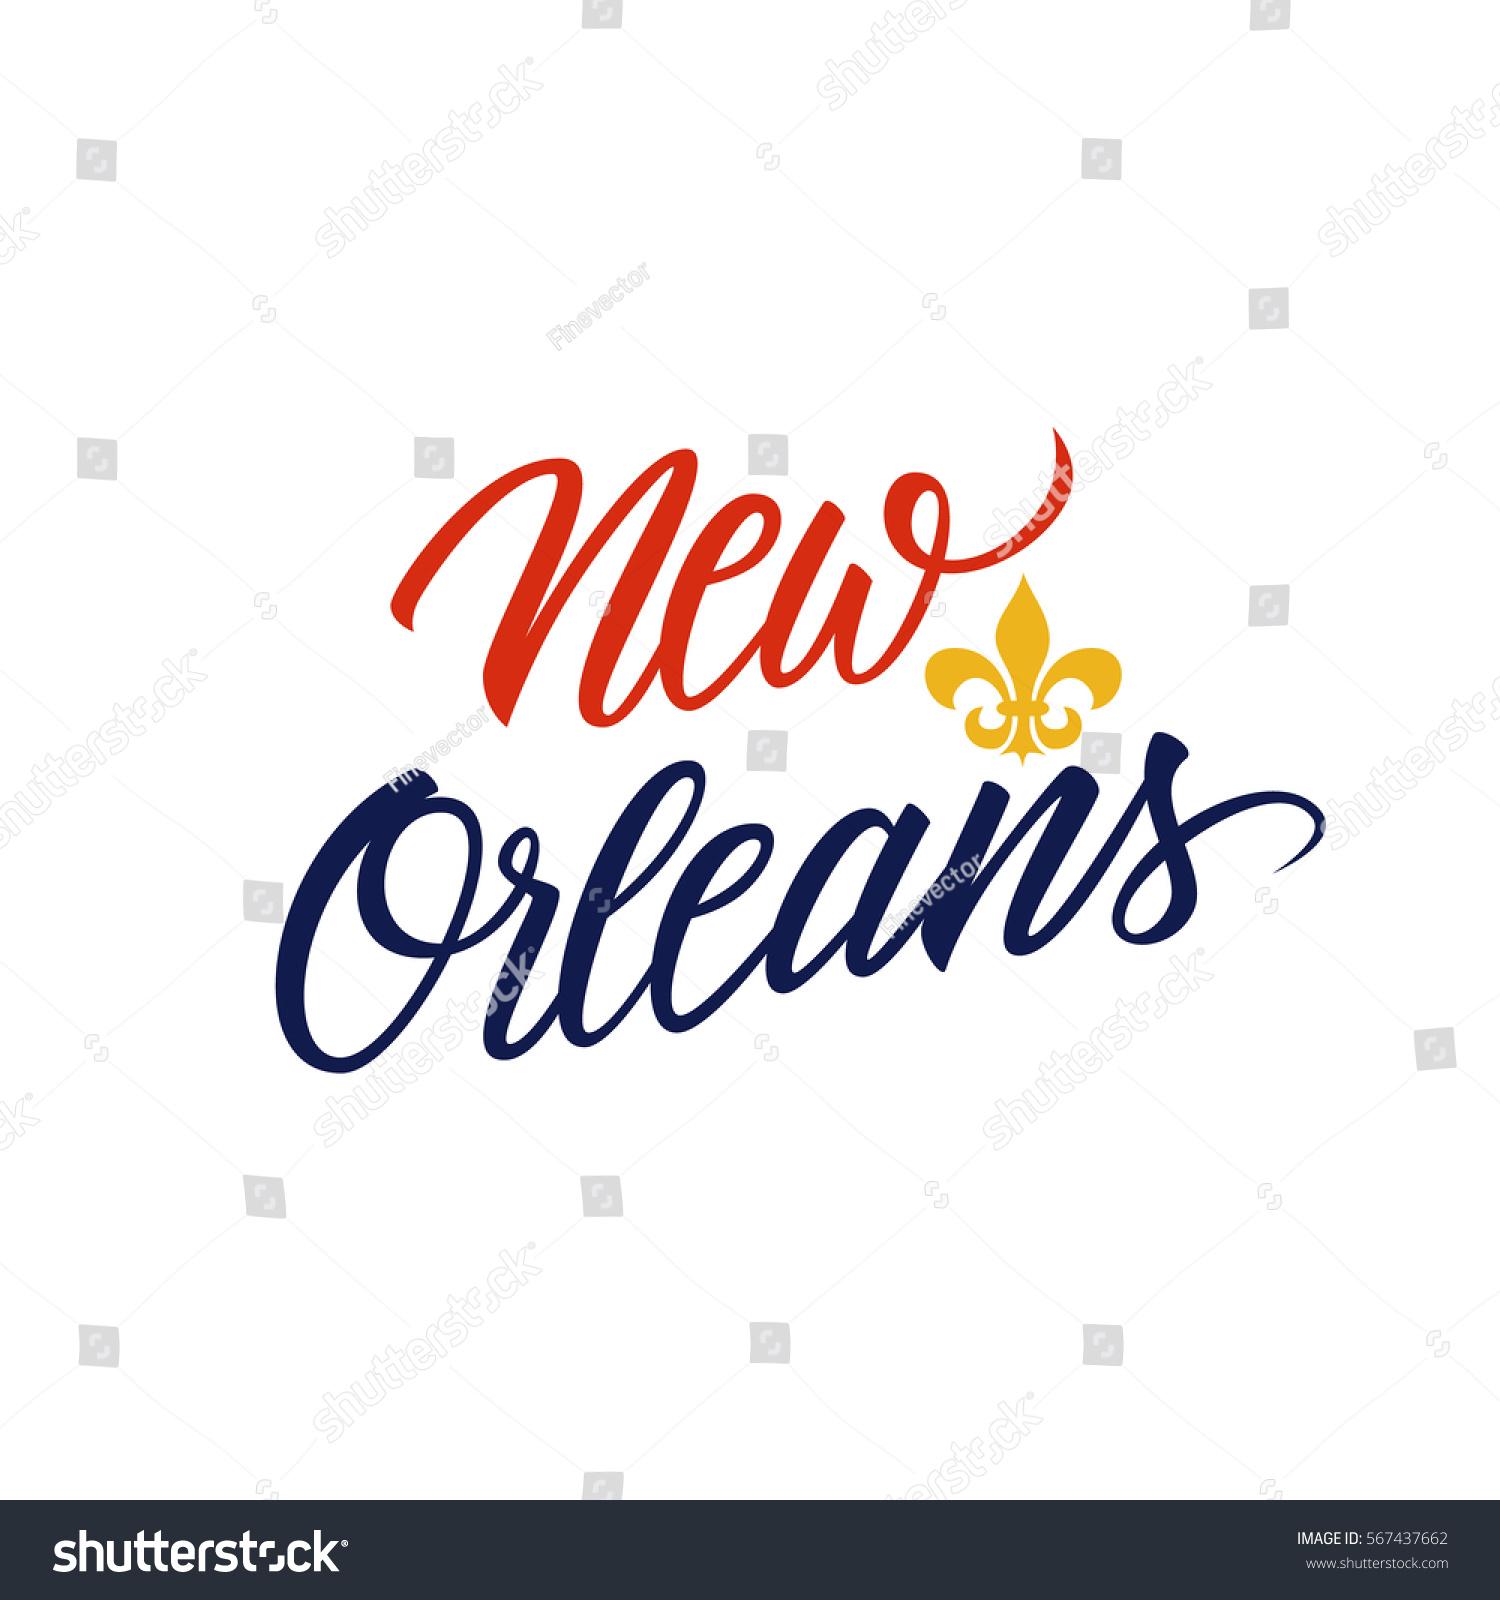 Handwritten city name new orleans fleur stock vector 567437662 handwritten city name new orleans with fleur de lis symbol vector illustration buycottarizona Images